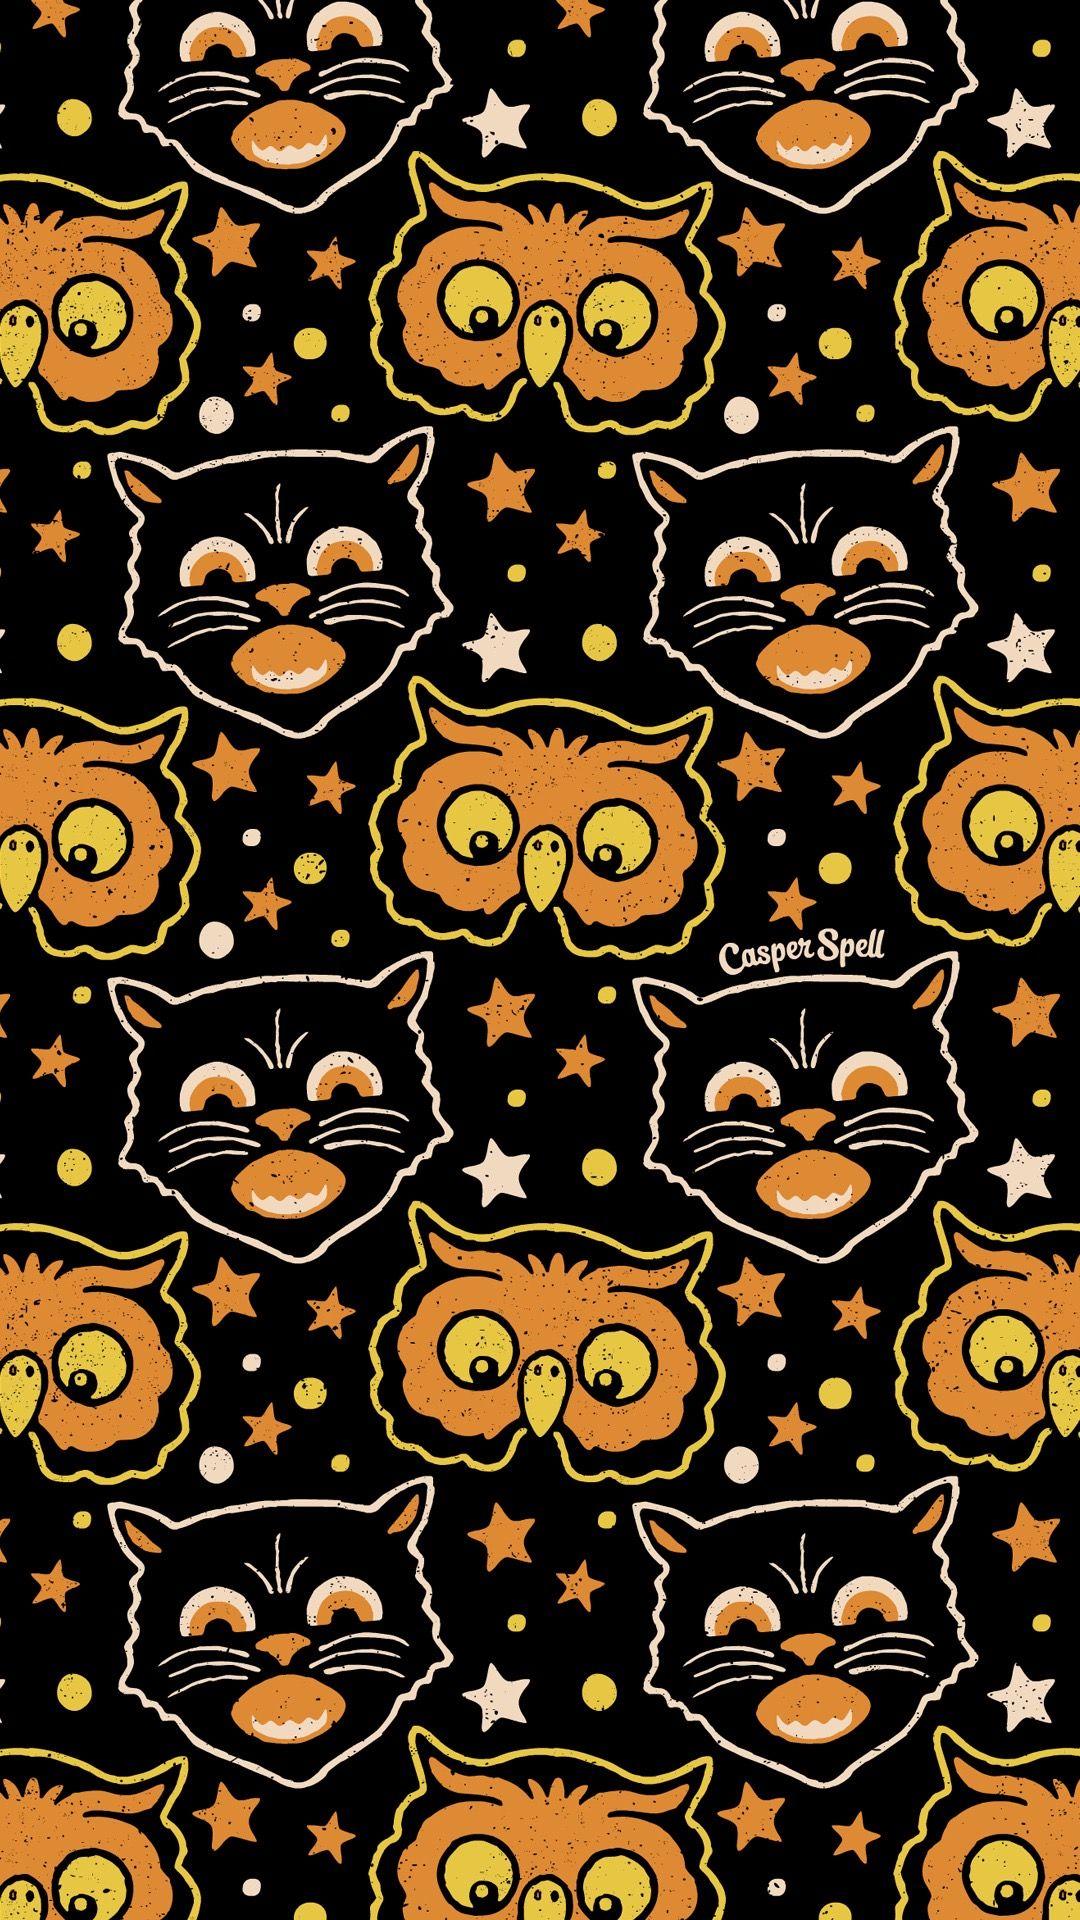 Pin By Miro Parol On 172 Wallpaper 172 Vintage Halloween Art Retro Halloween Halloween Wallpaper Backgrounds